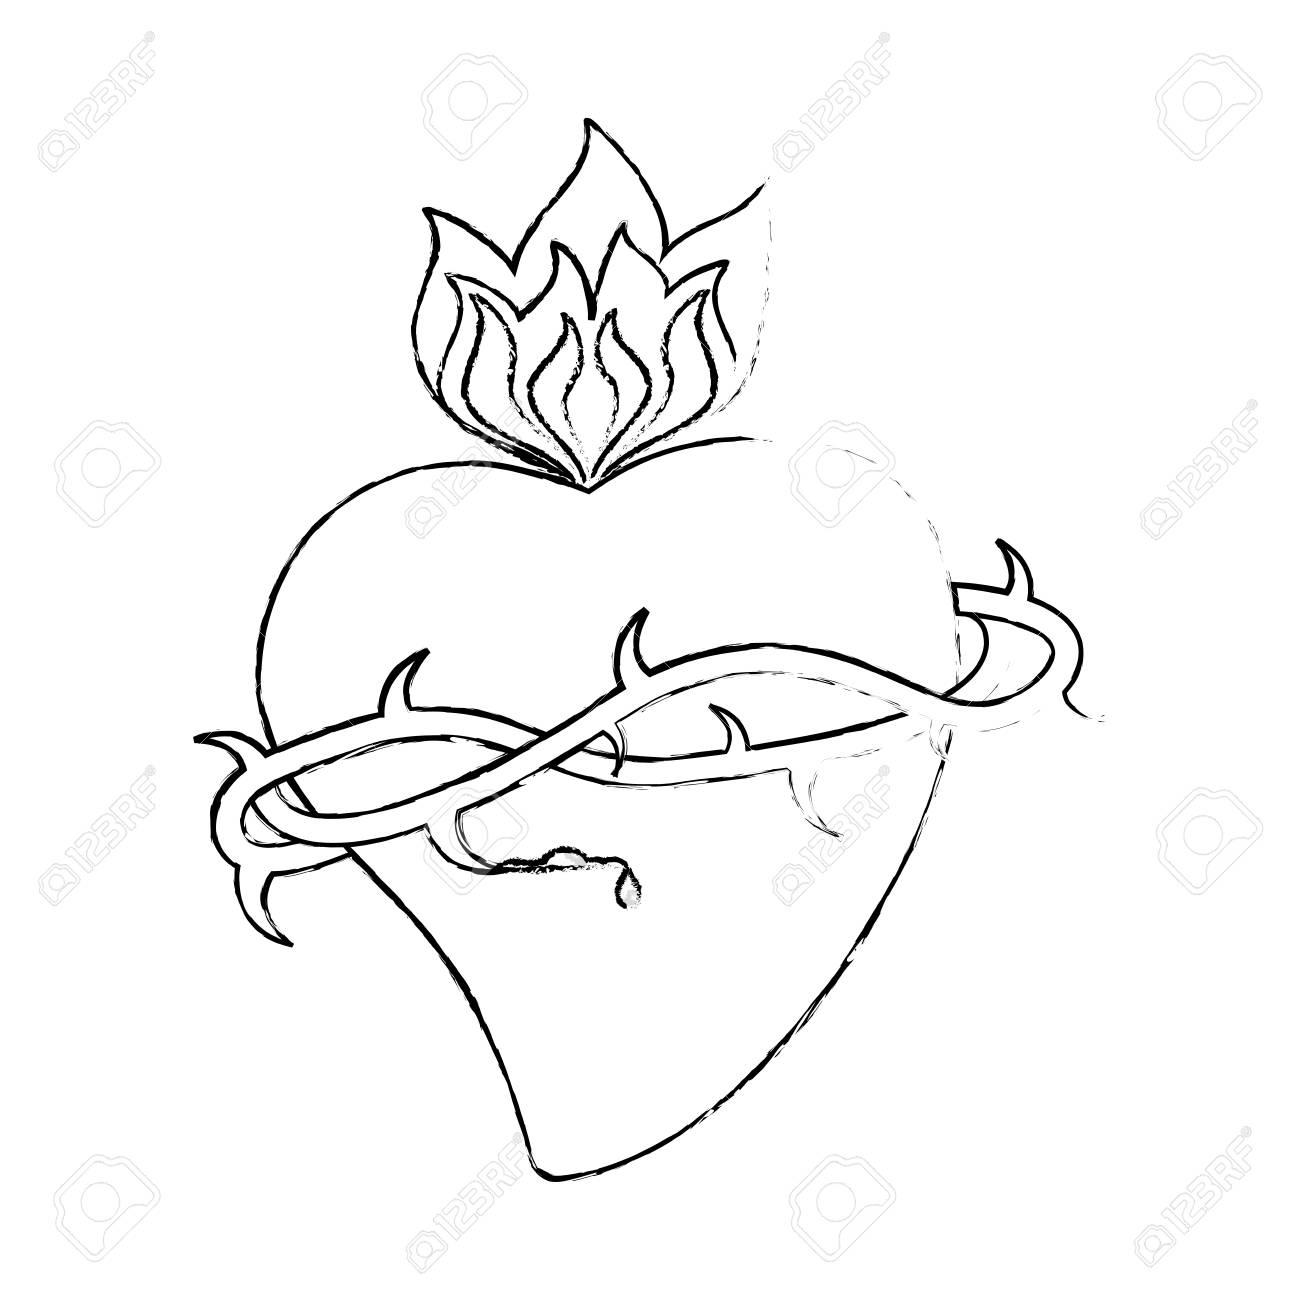 Corona Sagrada Corona Espinas Dibujo Vectorial Ilustración Eps 10